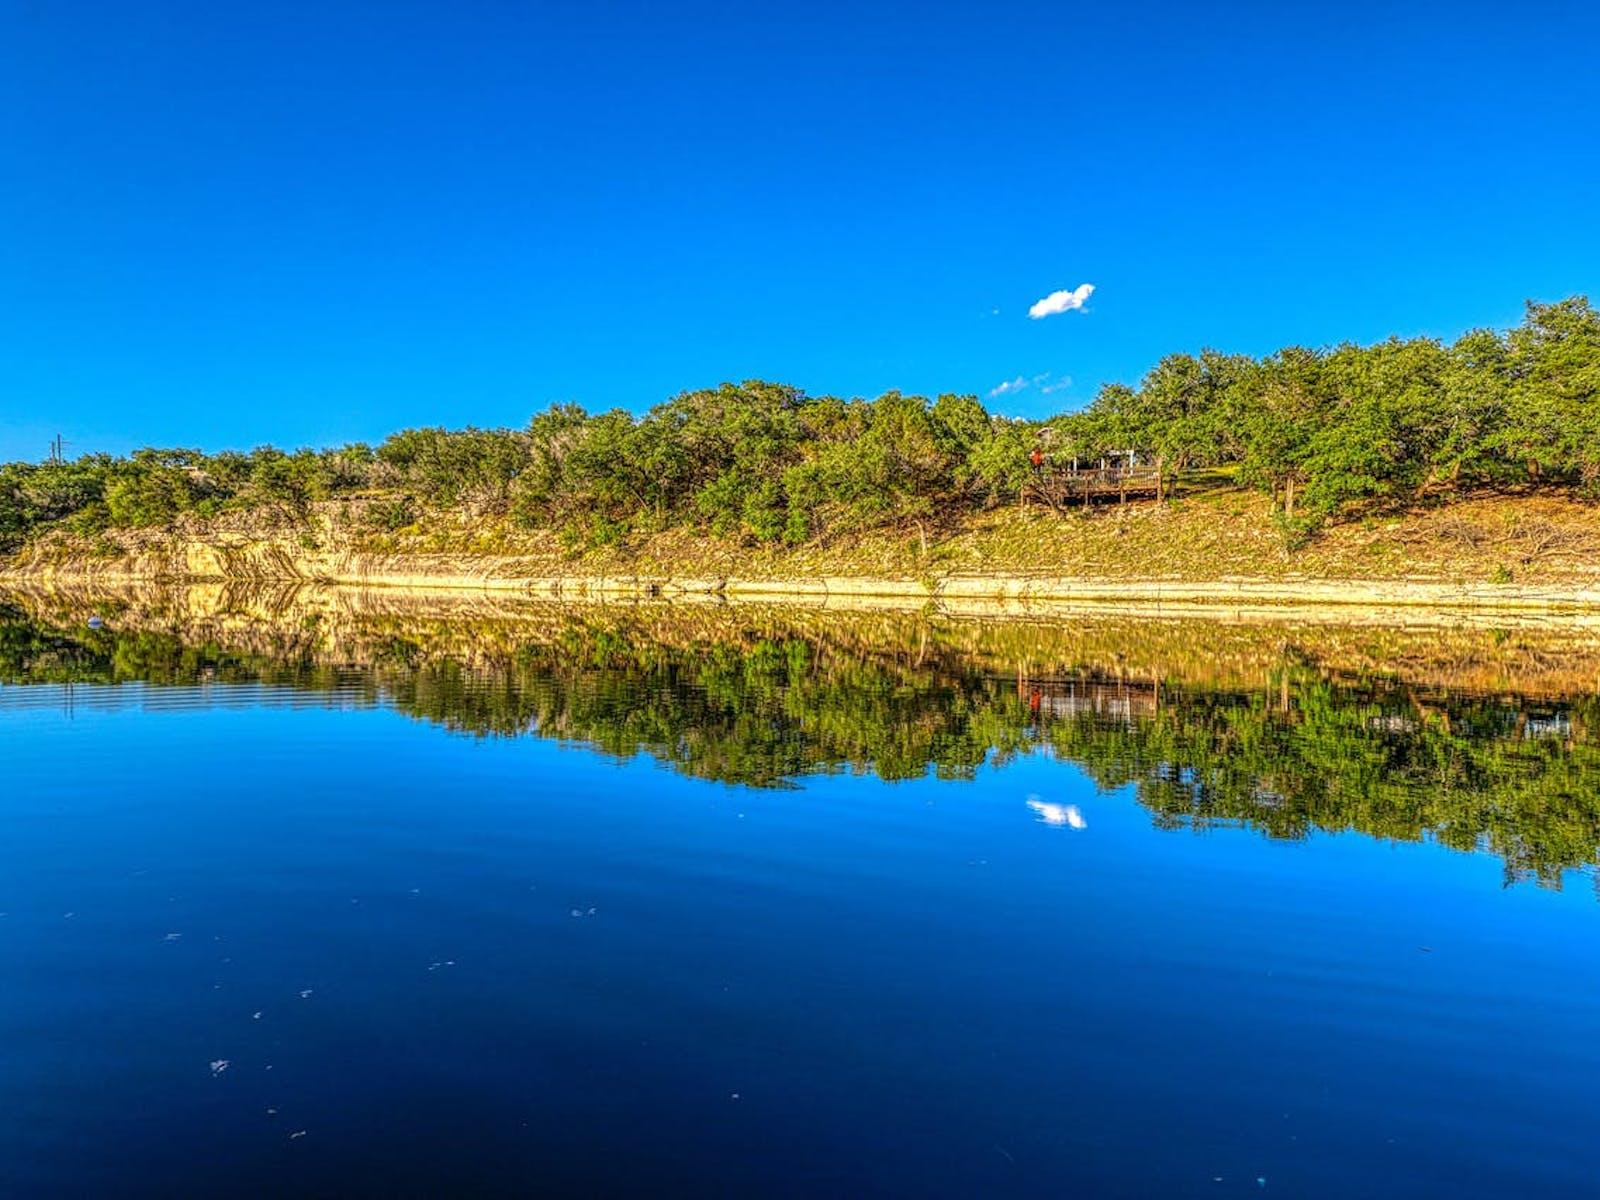 one cloud in blue ski over lake travis